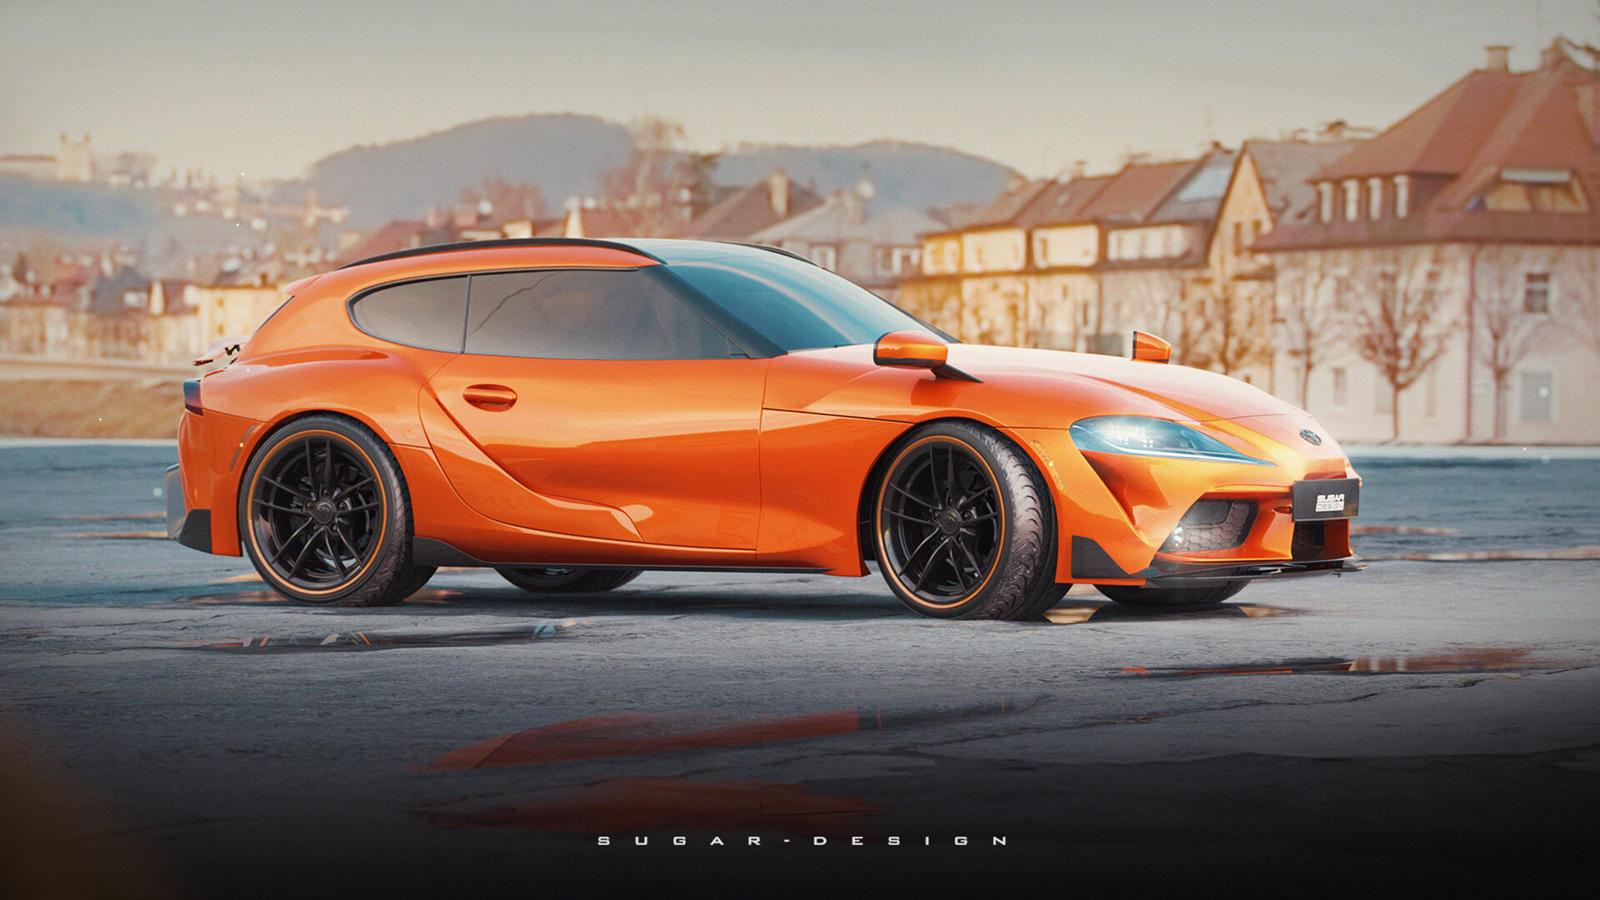 Kelebihan Kekurangan Toyota Su Review